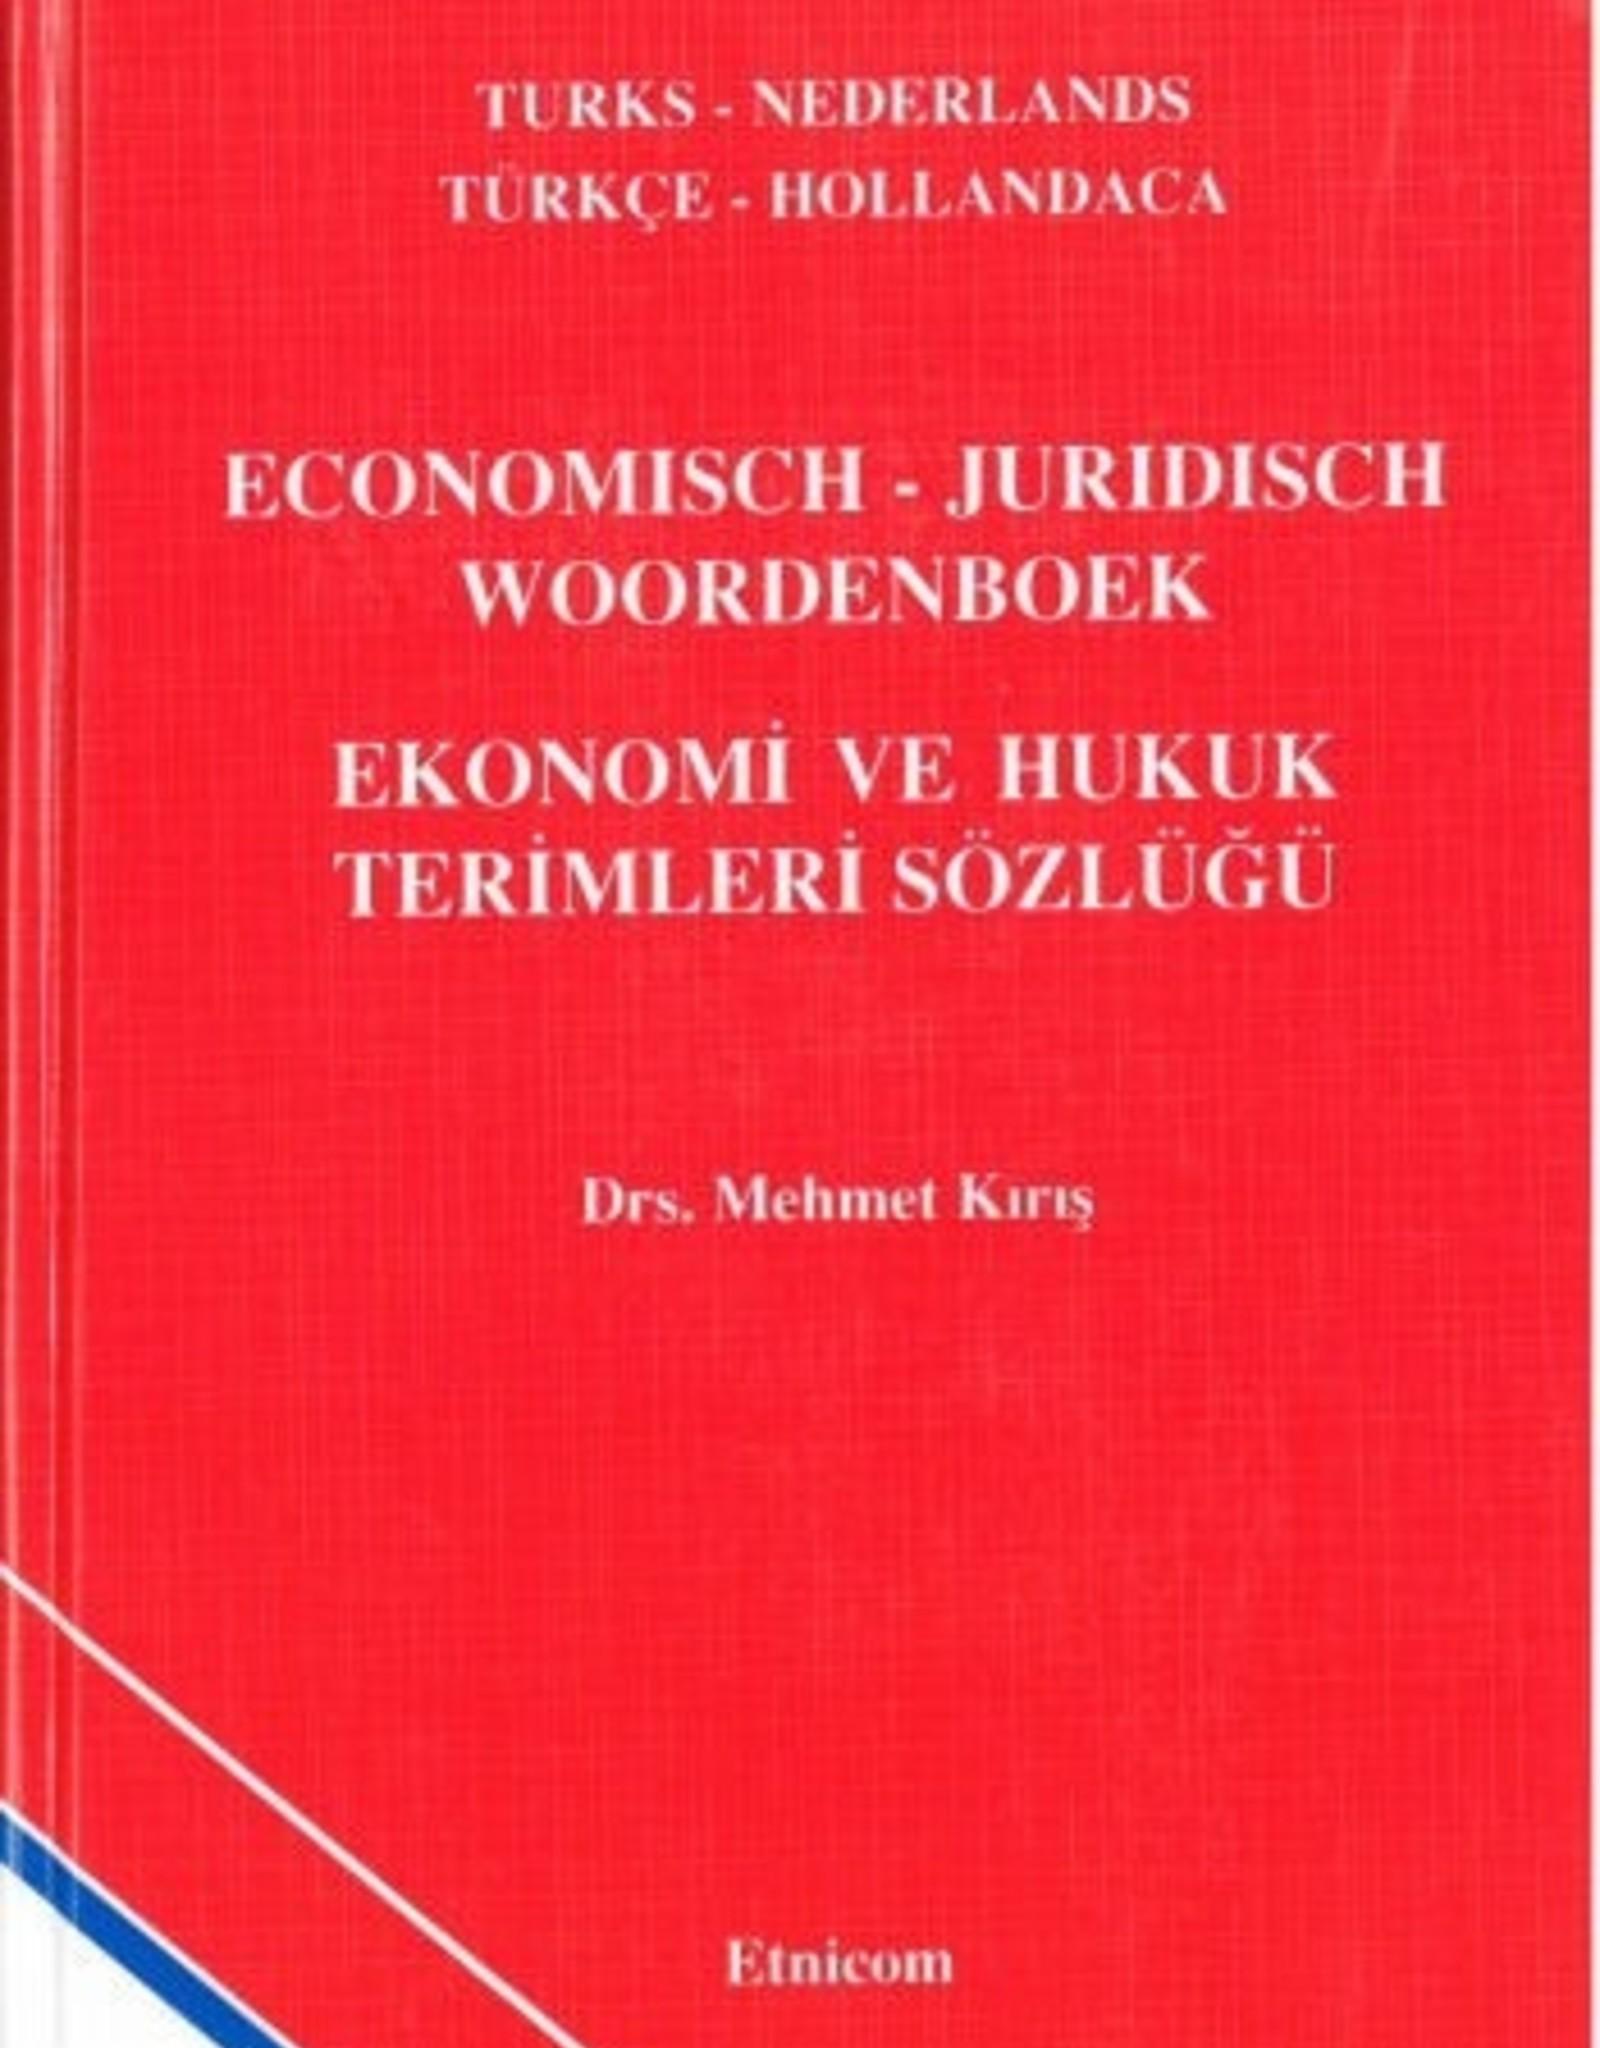 Economisch - Juridisch Woordenboek Turks - Nederlands